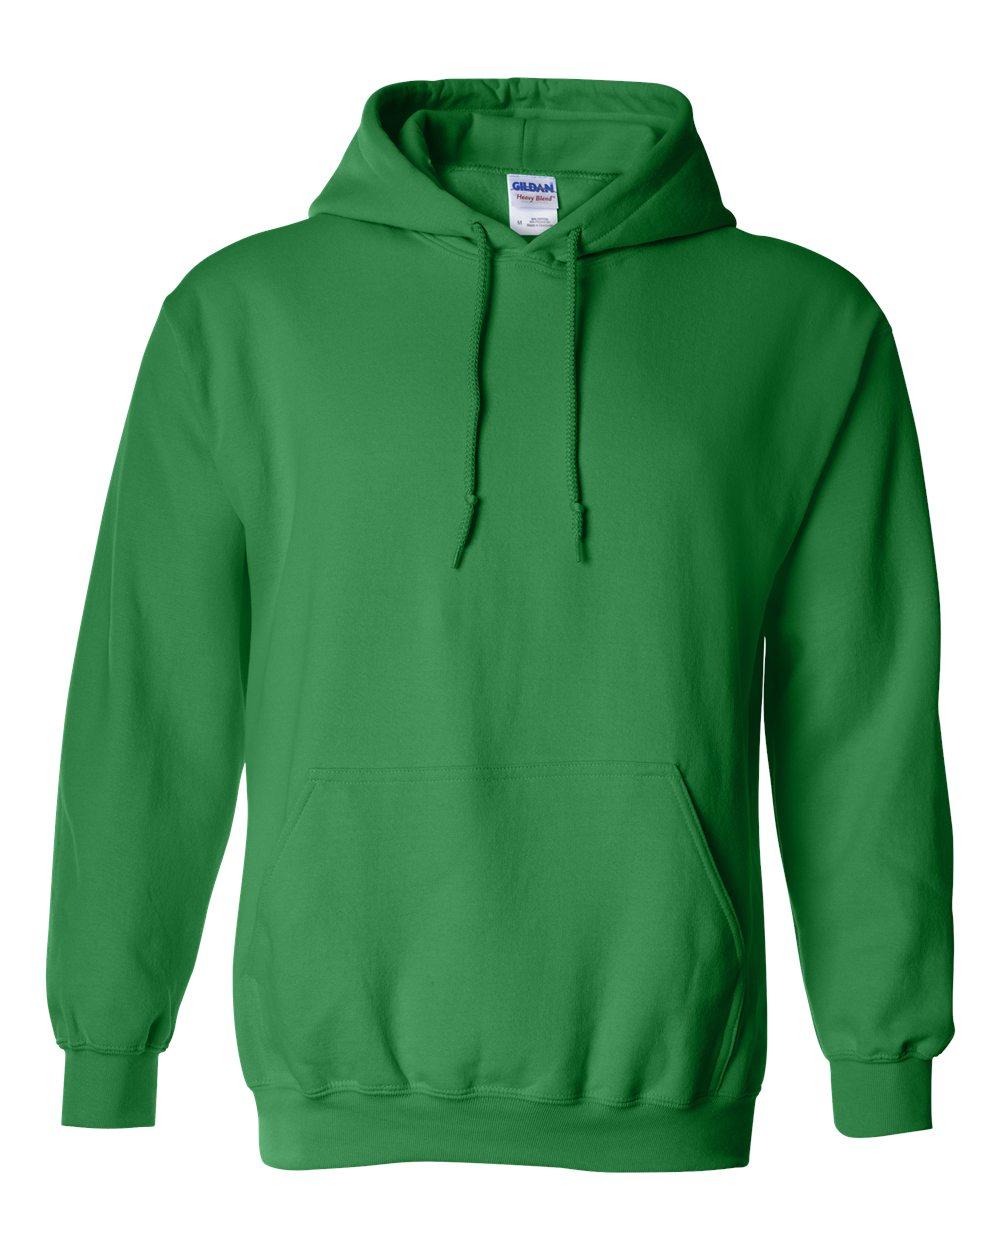 Gildan-Mens-Blank-Hoodie-Heavy-Blend-Hooded-Sweatshirt-Solid-18500-up-to-5XL thumbnail 42